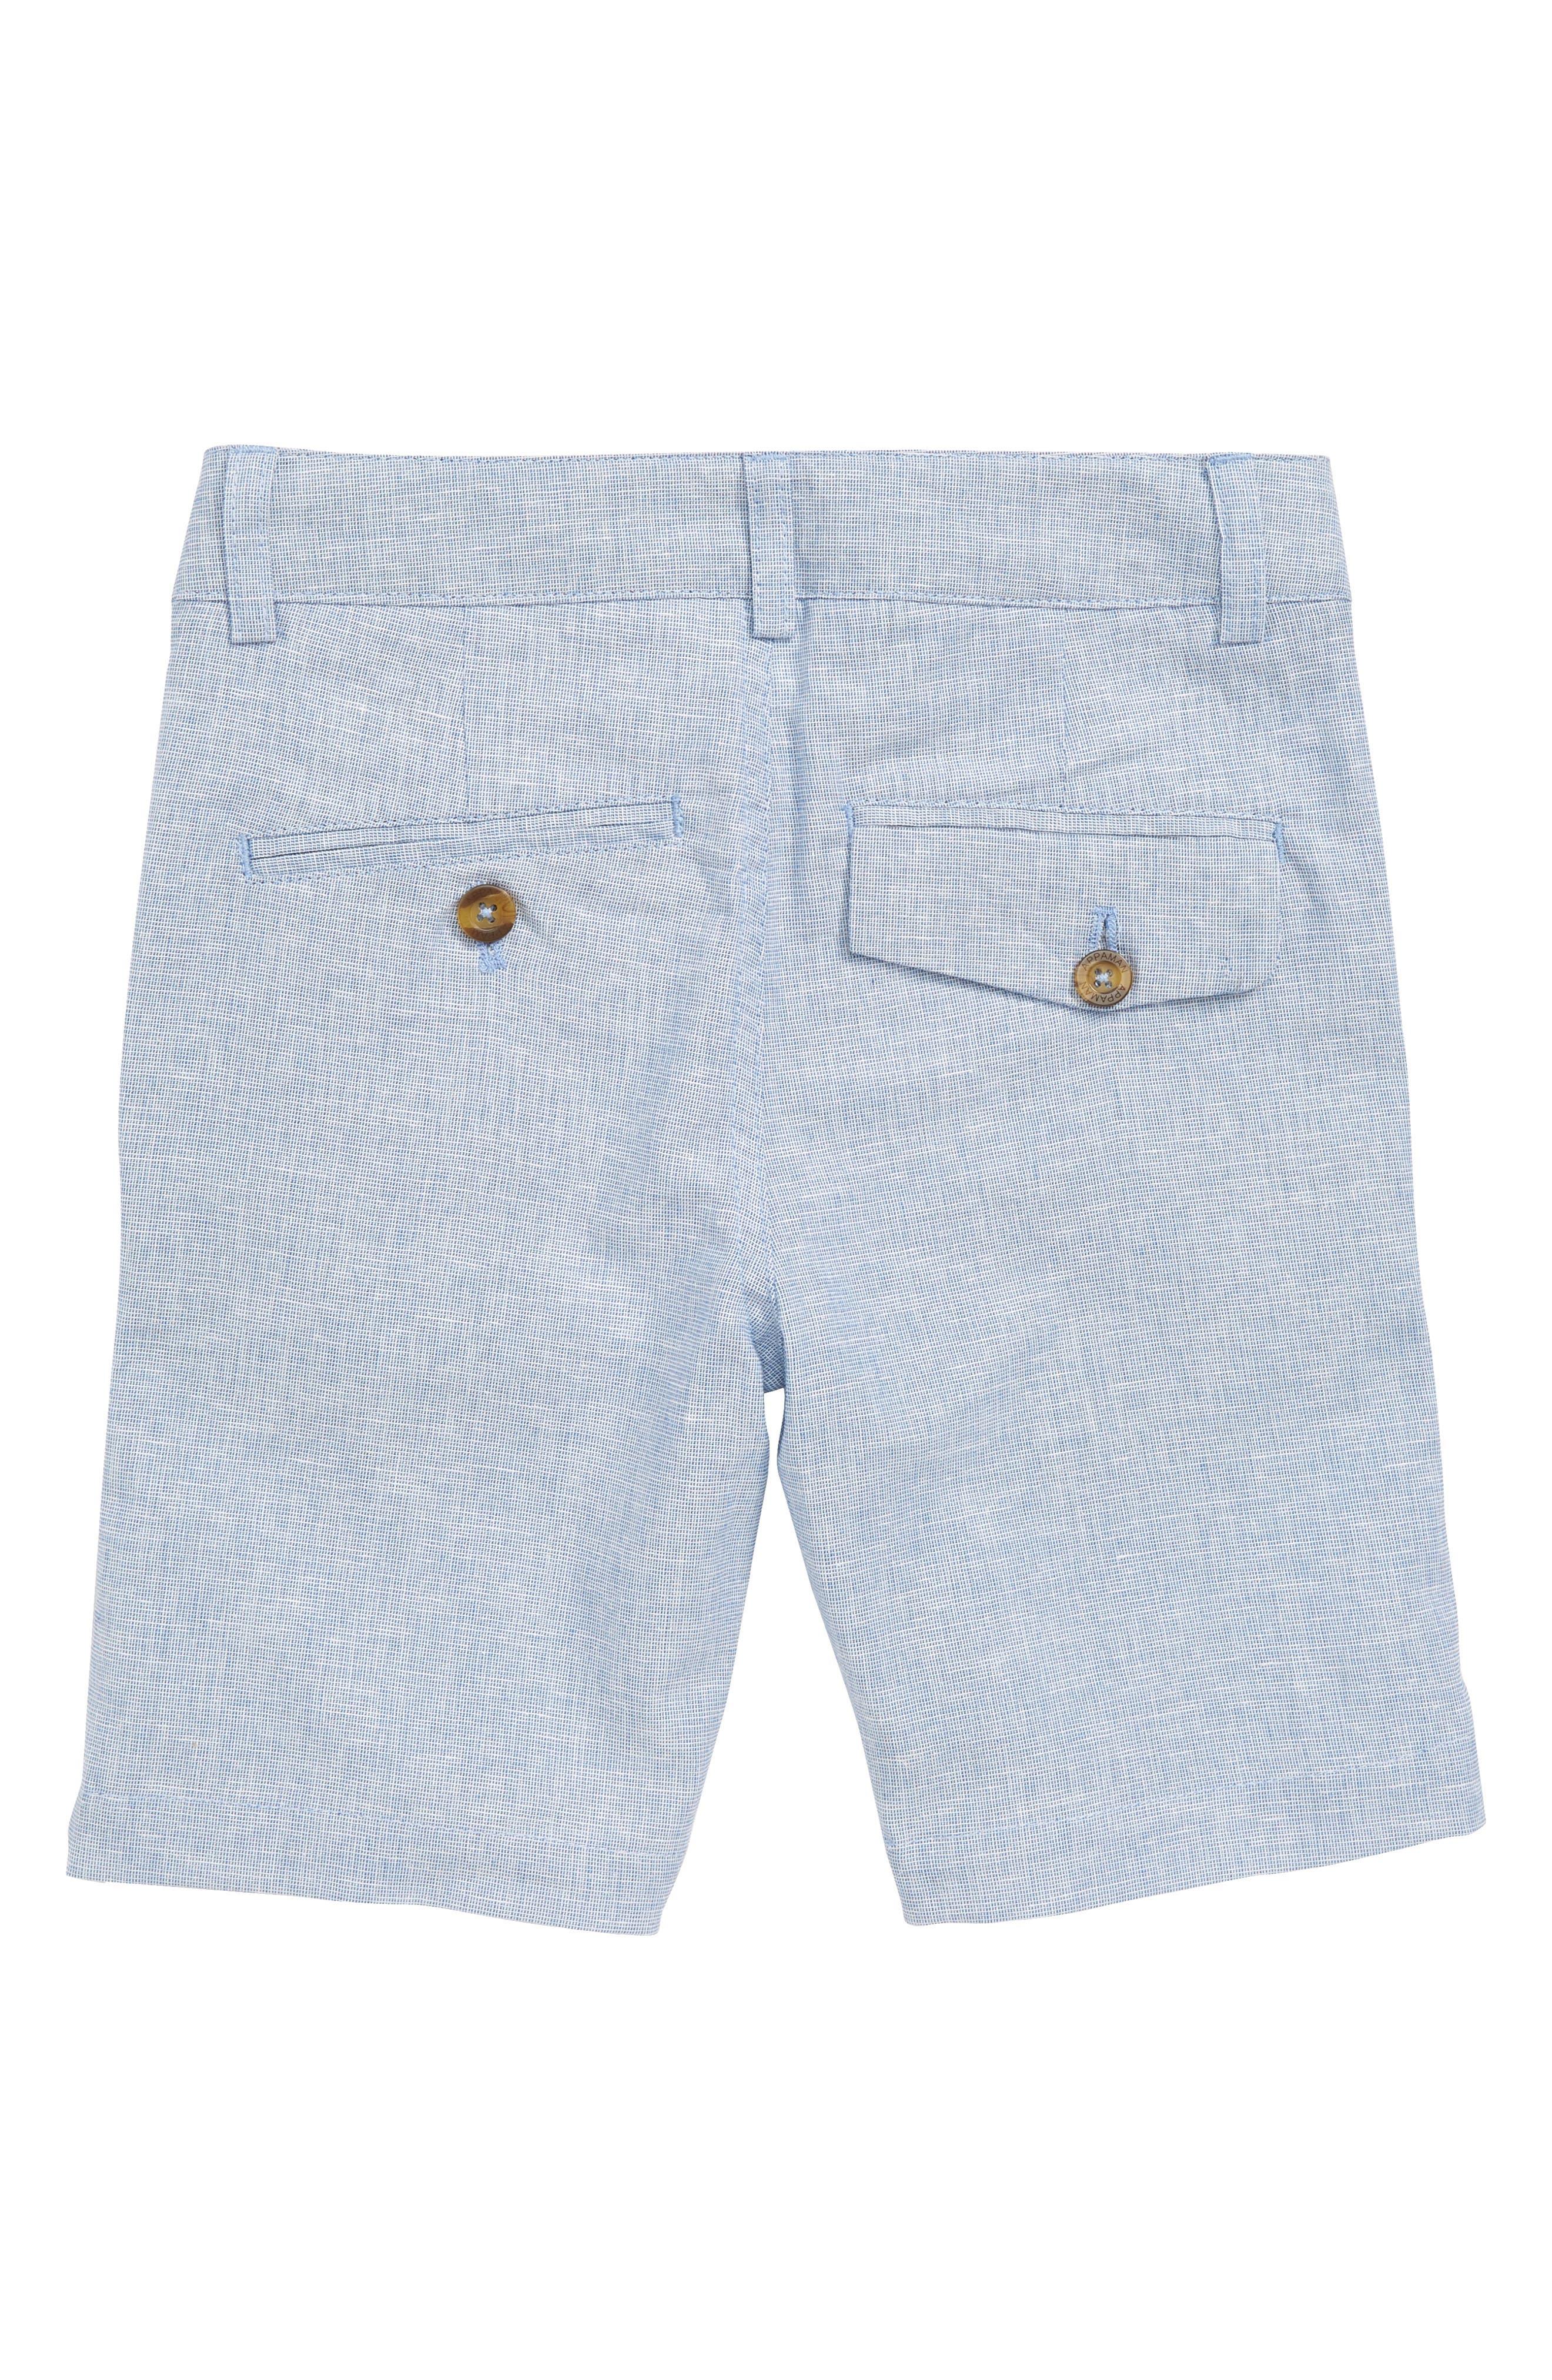 Trouser Shorts,                             Alternate thumbnail 2, color,                             Sky Club